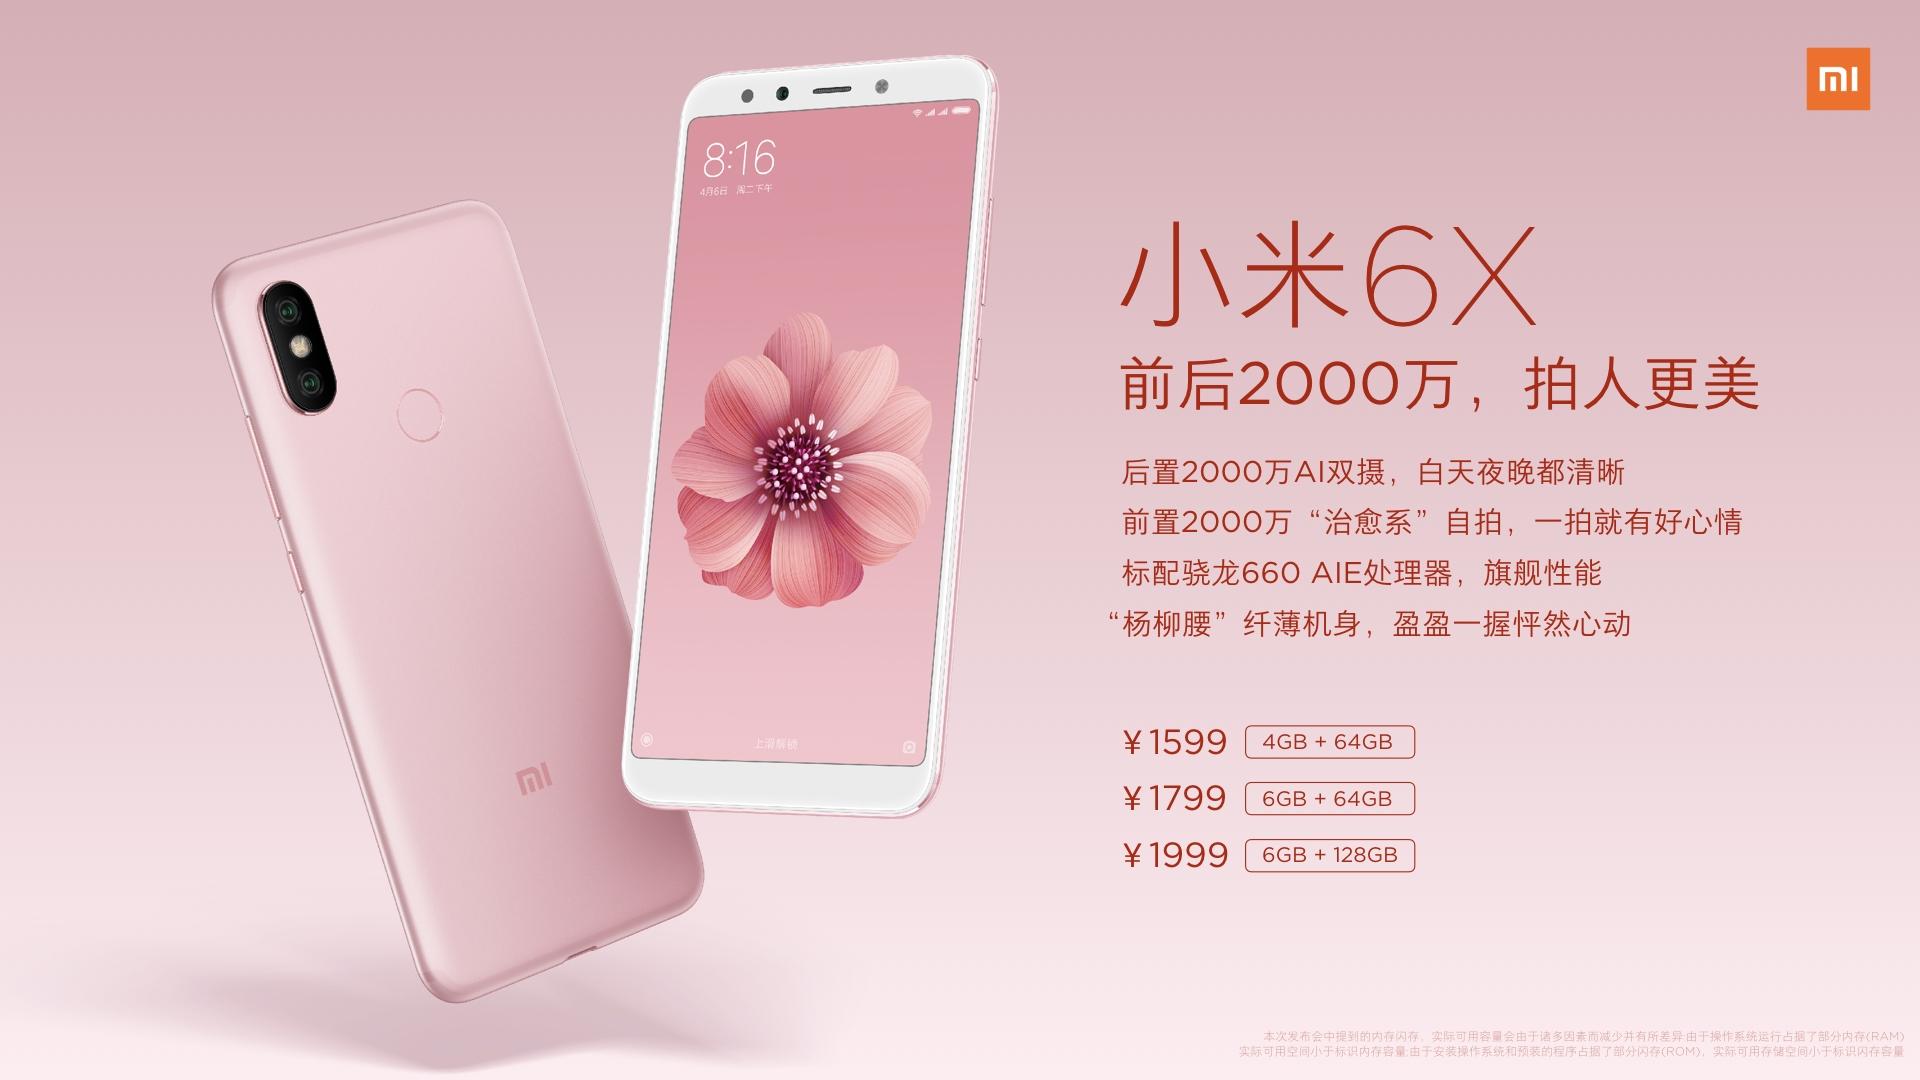 Xiaomi Mi 6X pricing